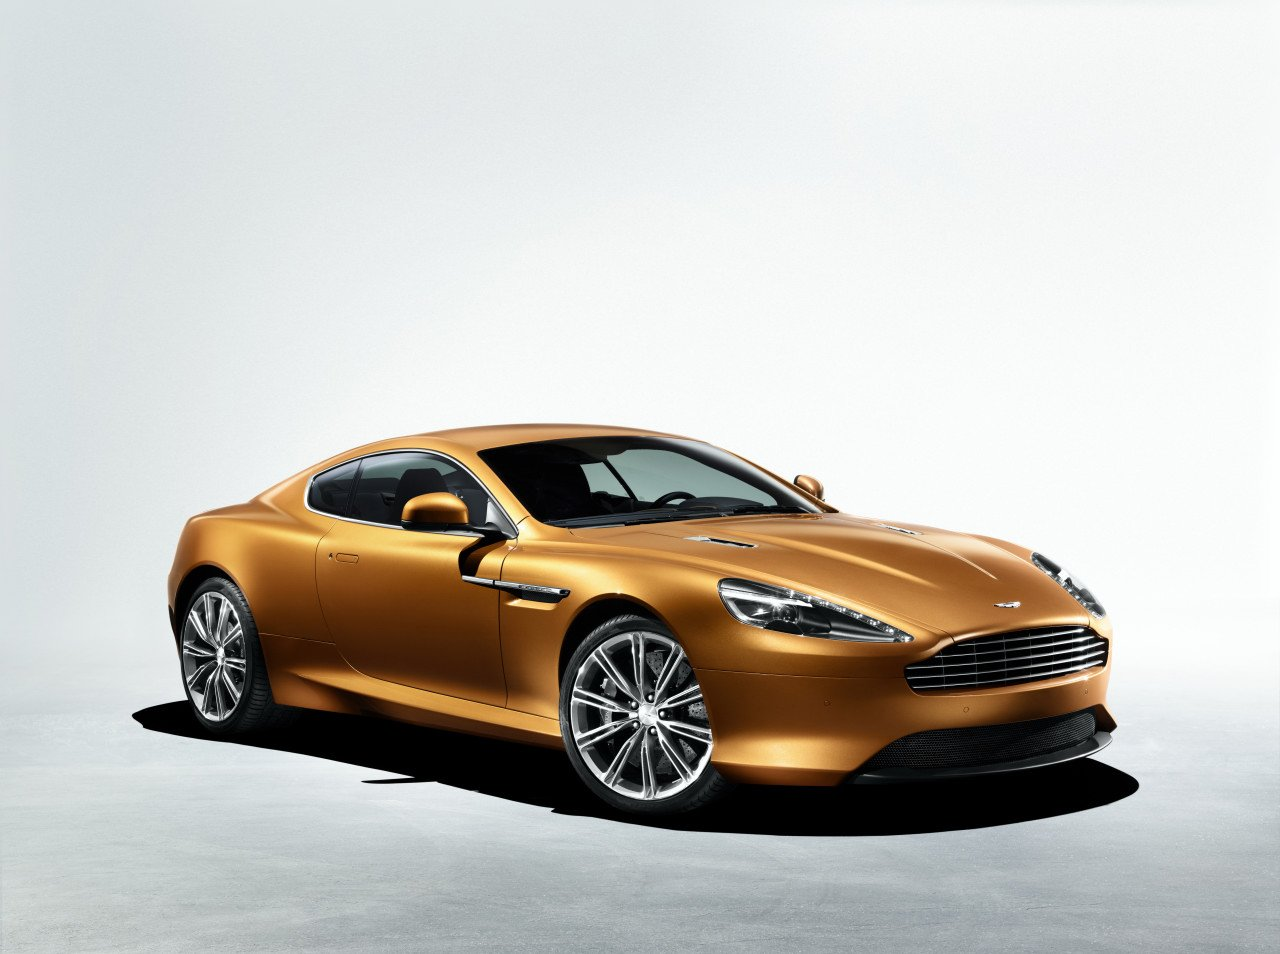 Aston Martin Virage Specs 0 60 Quarter Mile Lap Times Fastestlaps Com